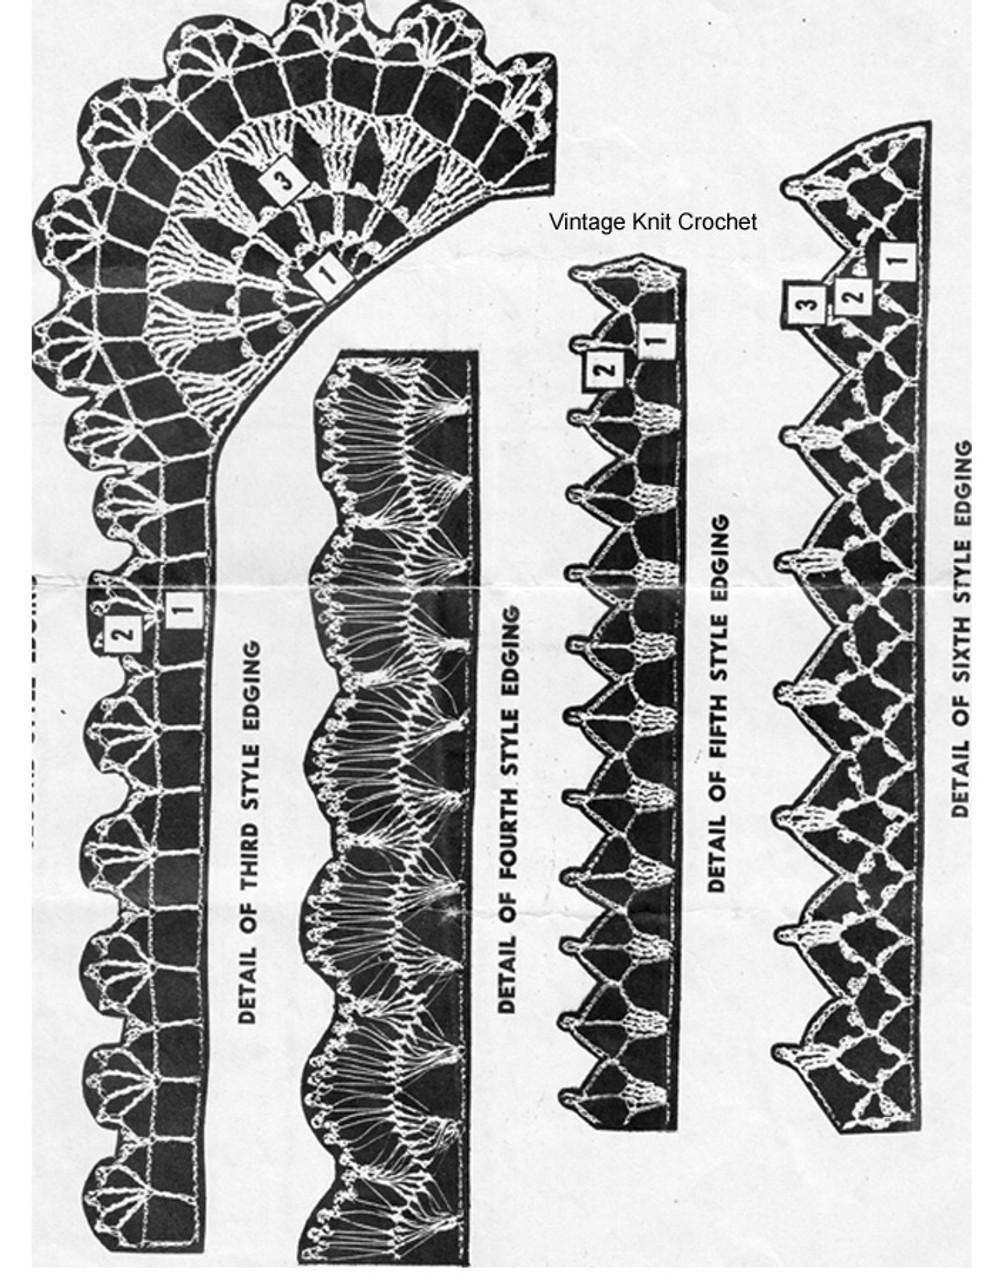 Crochet Edging Pattern Stitch Illustration for Design 3083